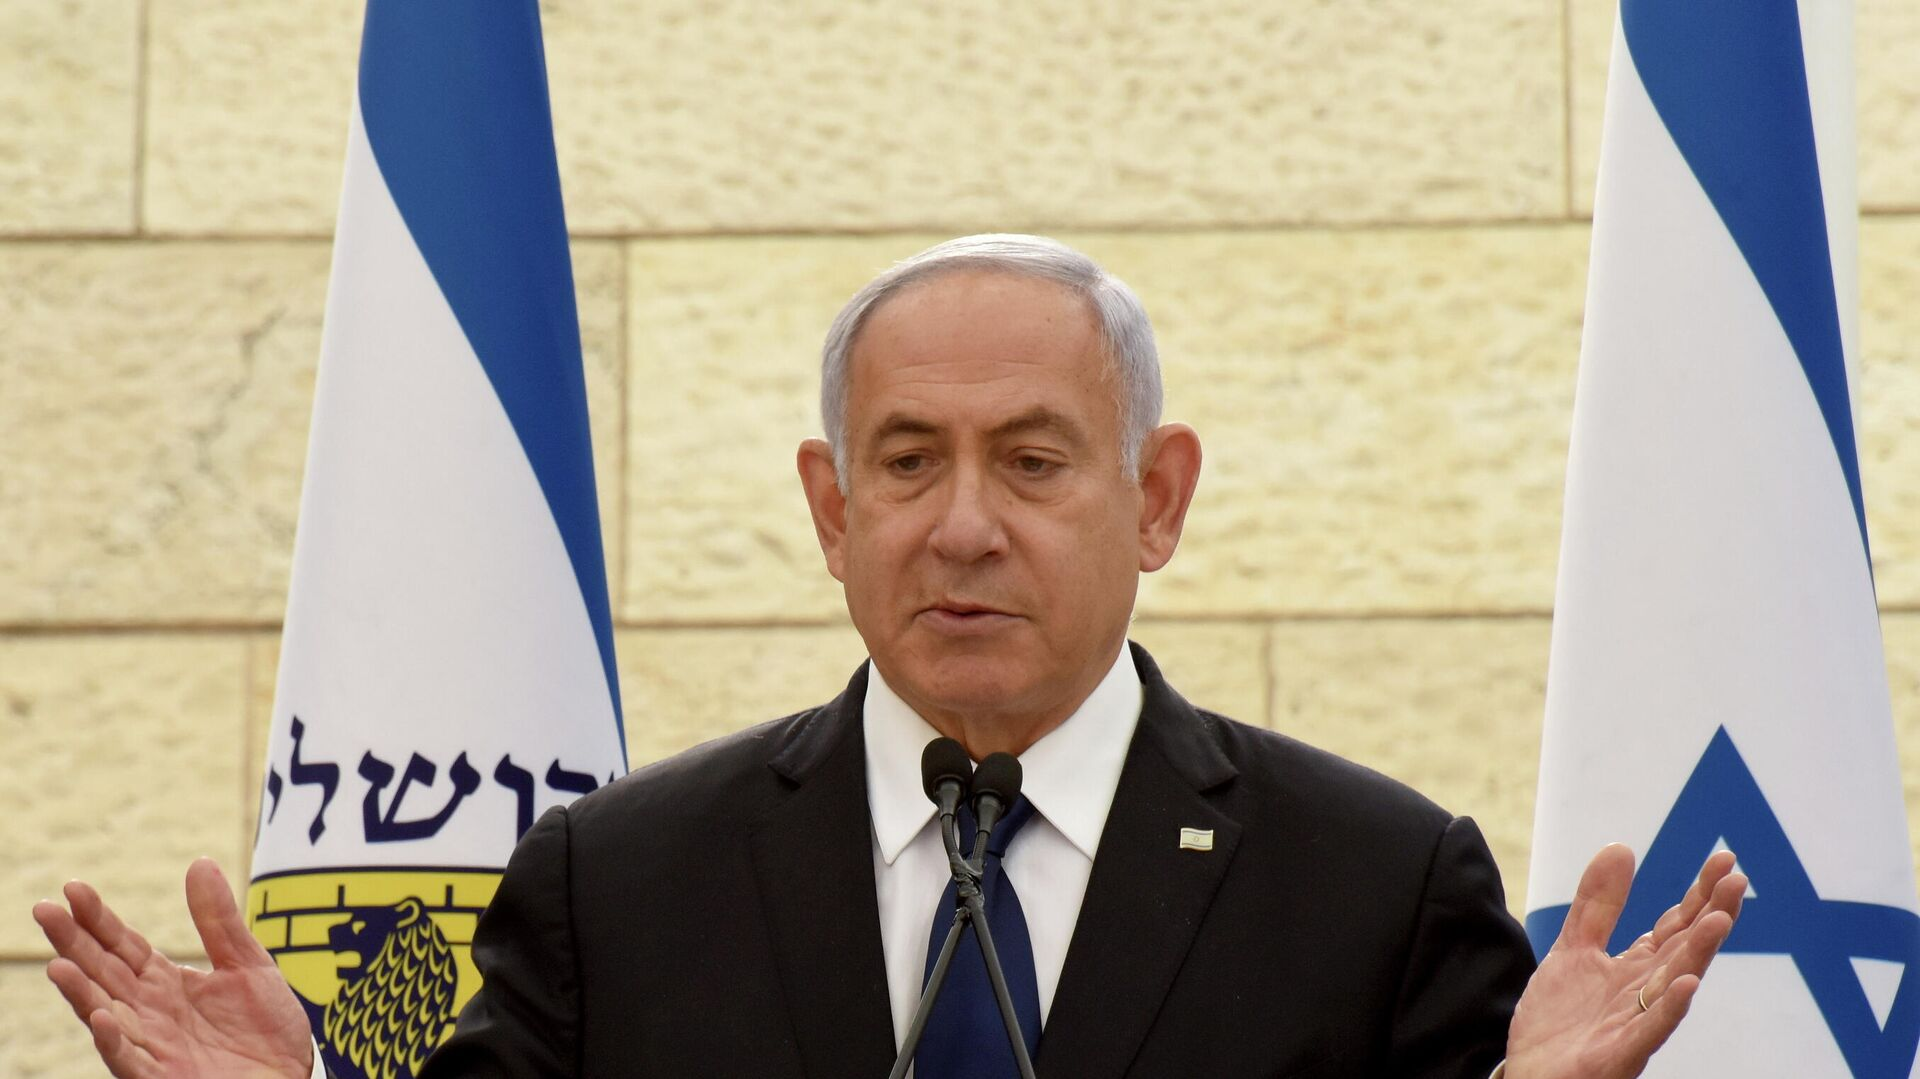 Benjamín Netanyahu, primer ministro israelí - Sputnik Mundo, 1920, 28.04.2021